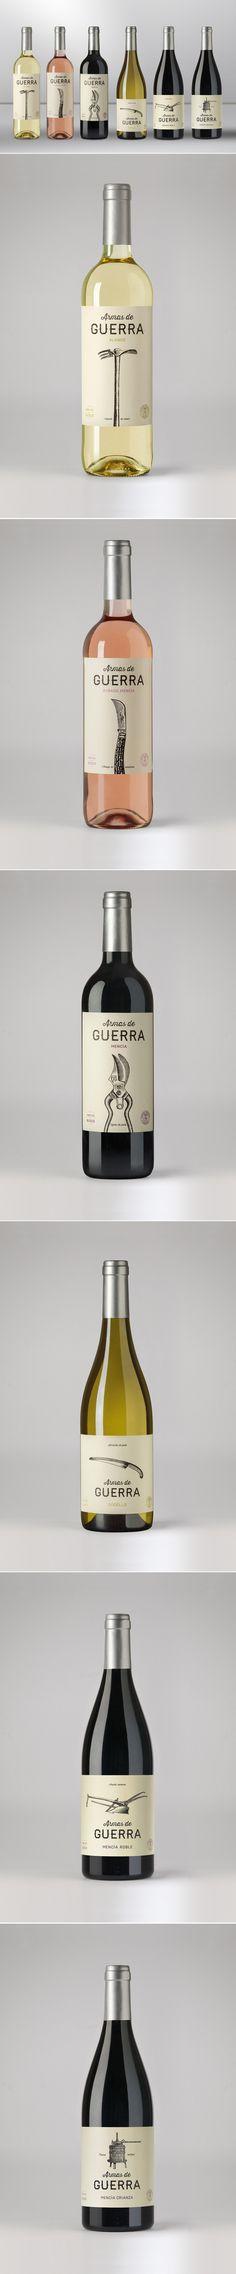 Armas de Guerra. Wine of Spain. #taninotanino